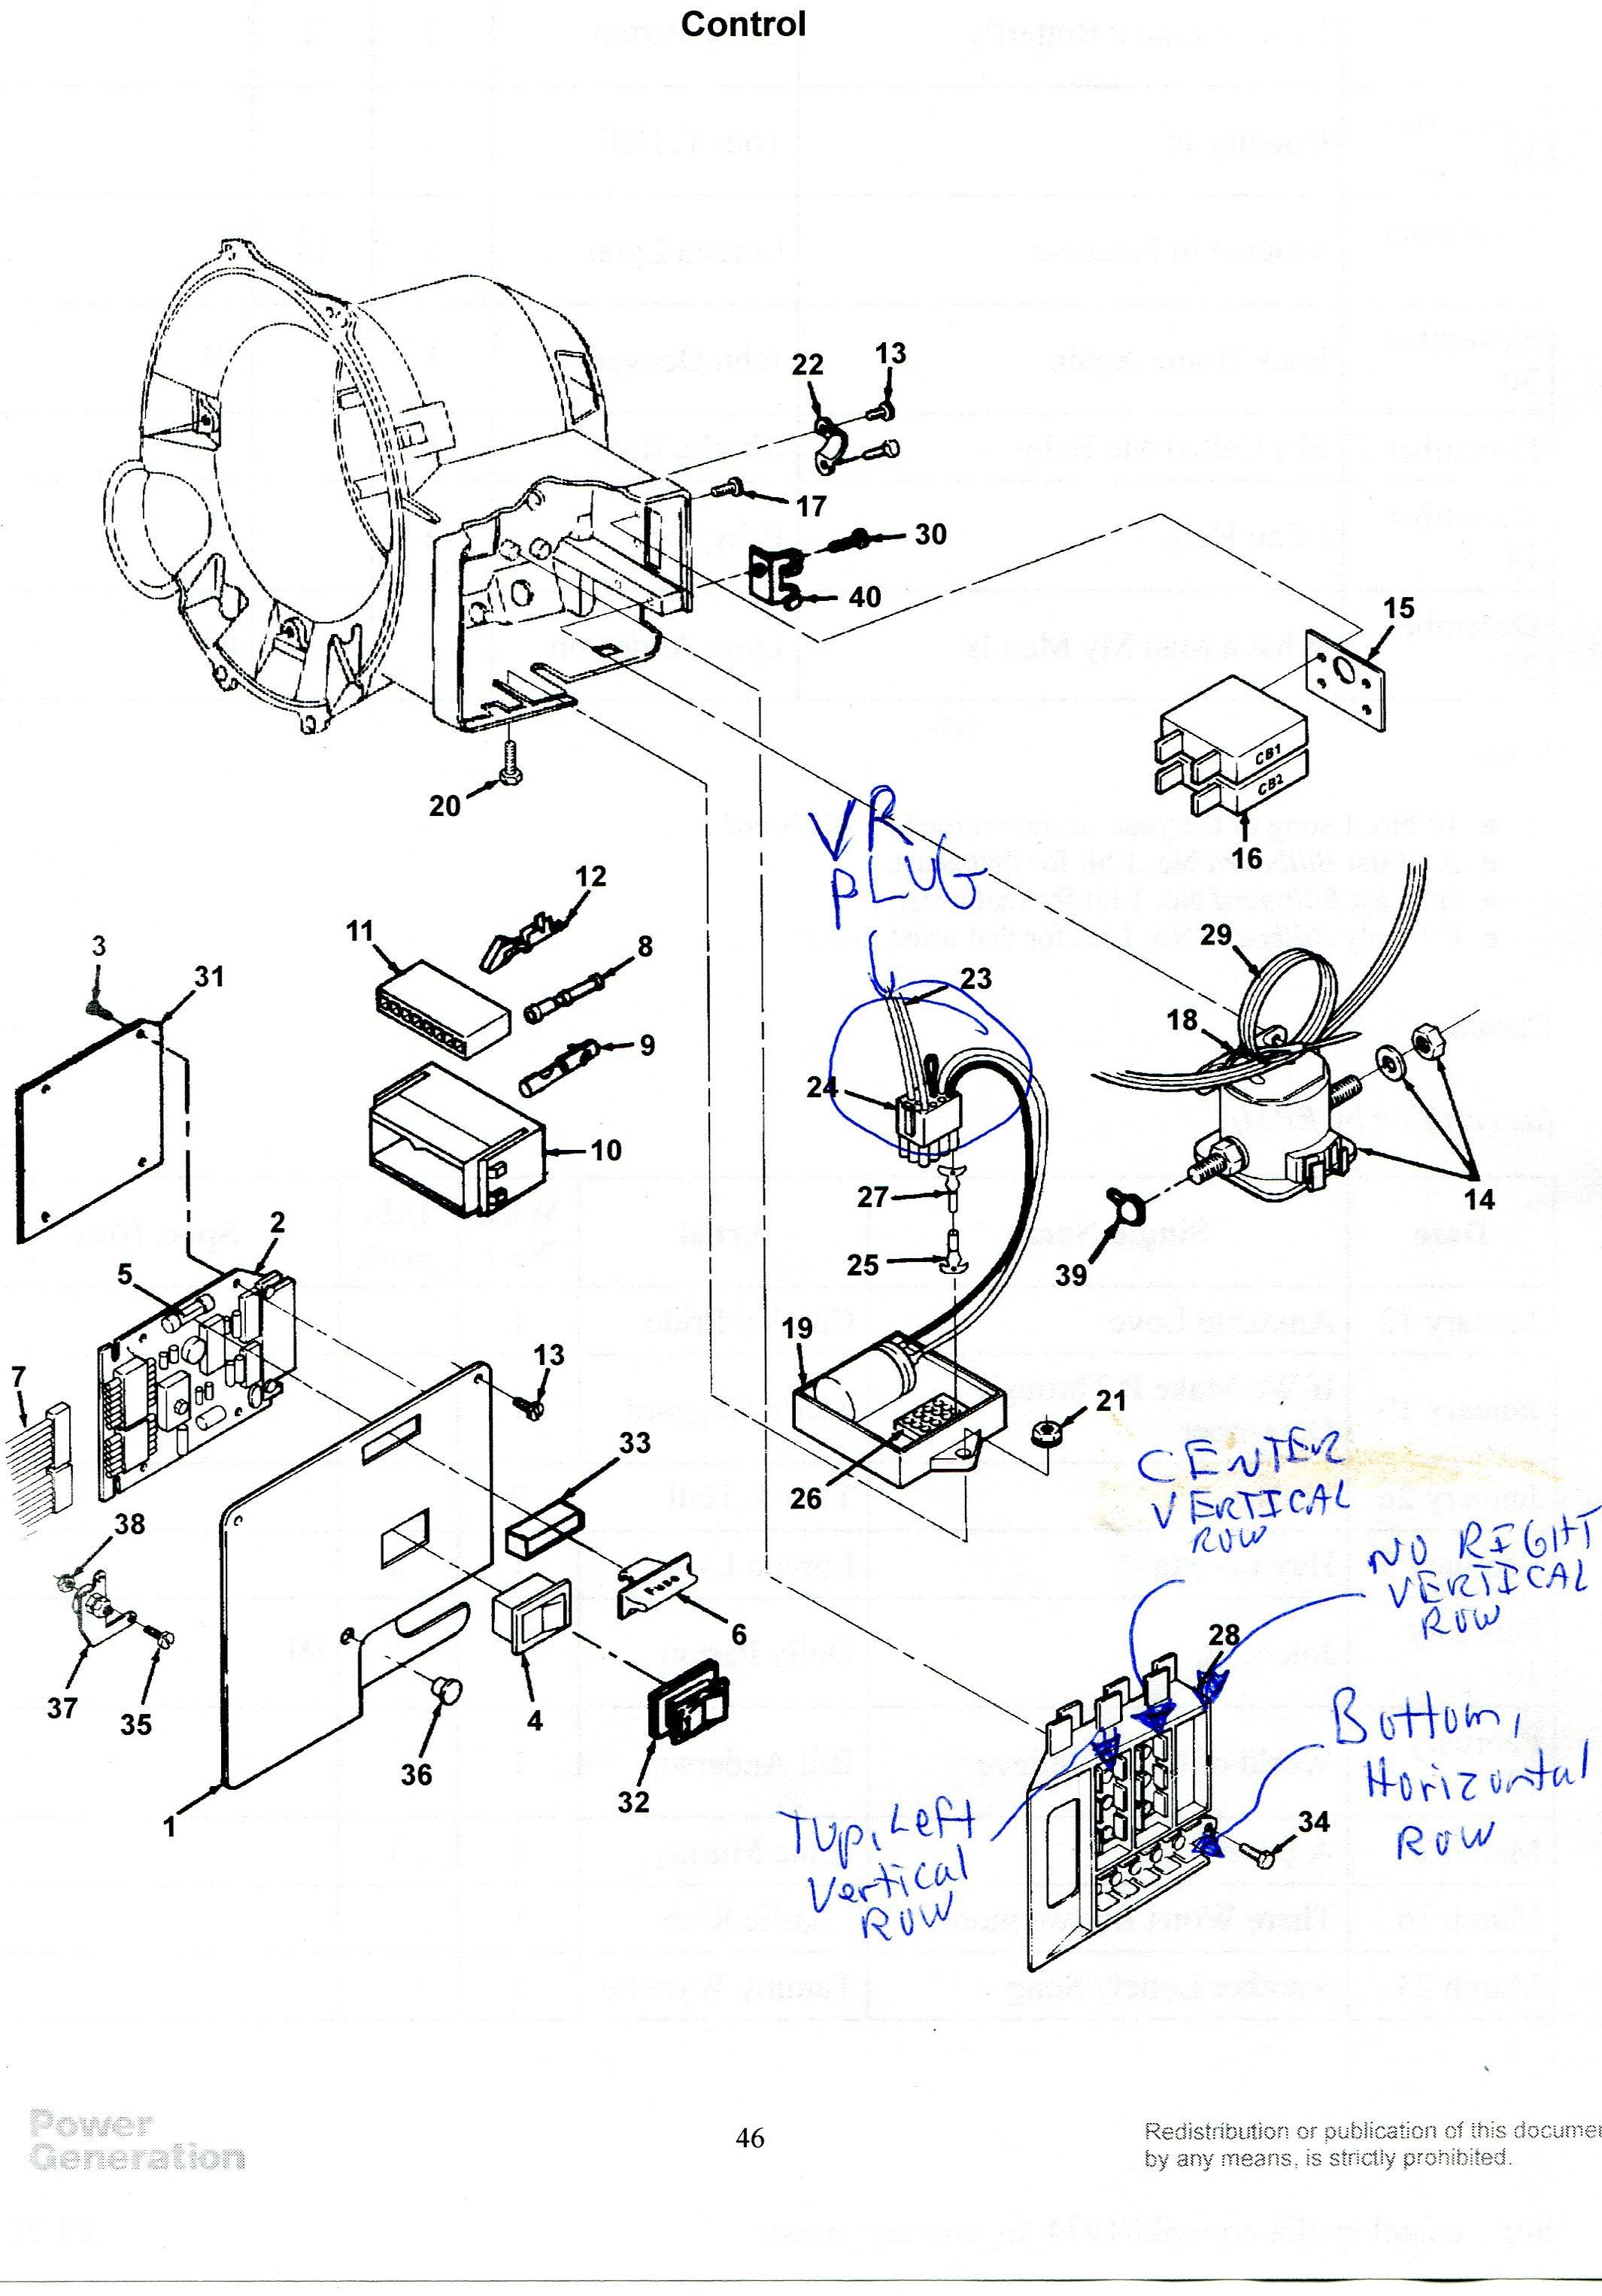 Onan 300c859 Control Wiring Diagram